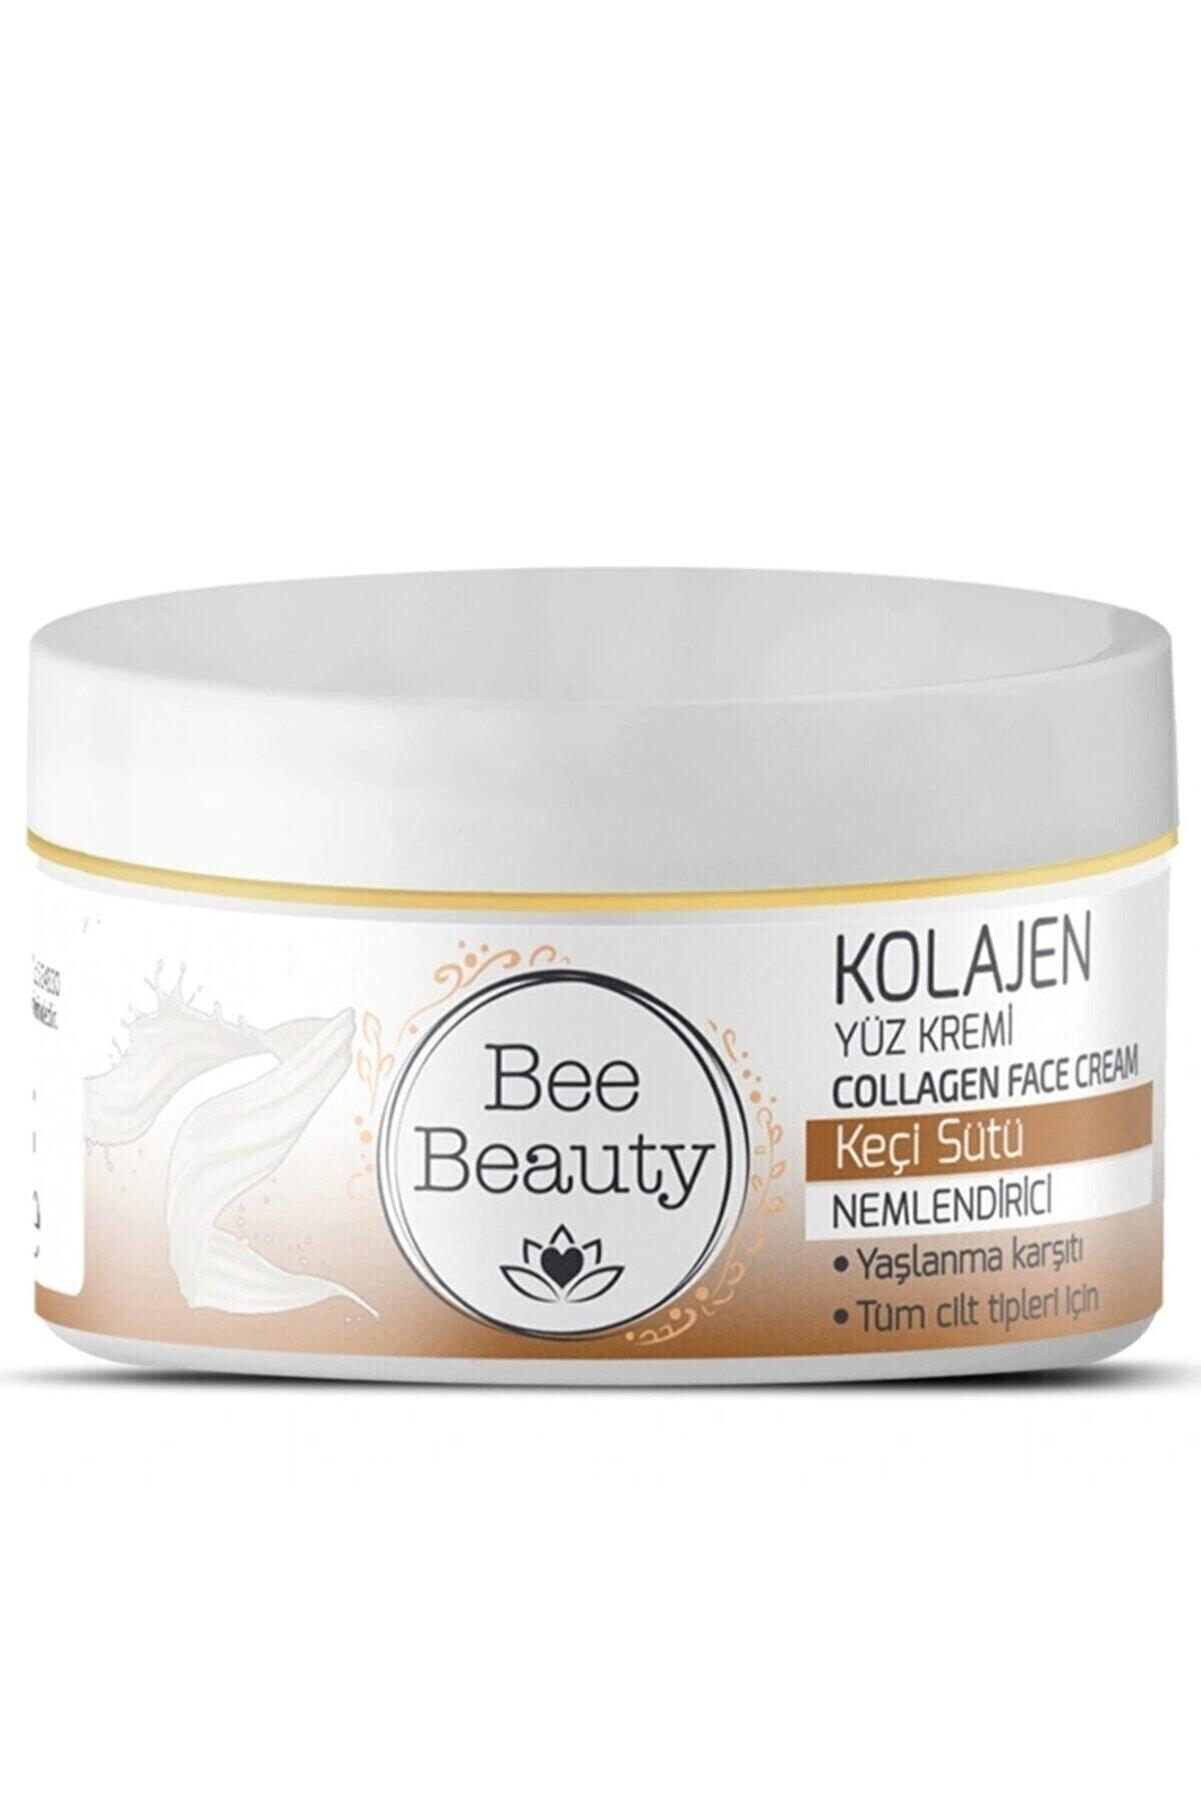 Bee Beauty Keçi Sütü Kolajen Yüz Kremi 50 ml